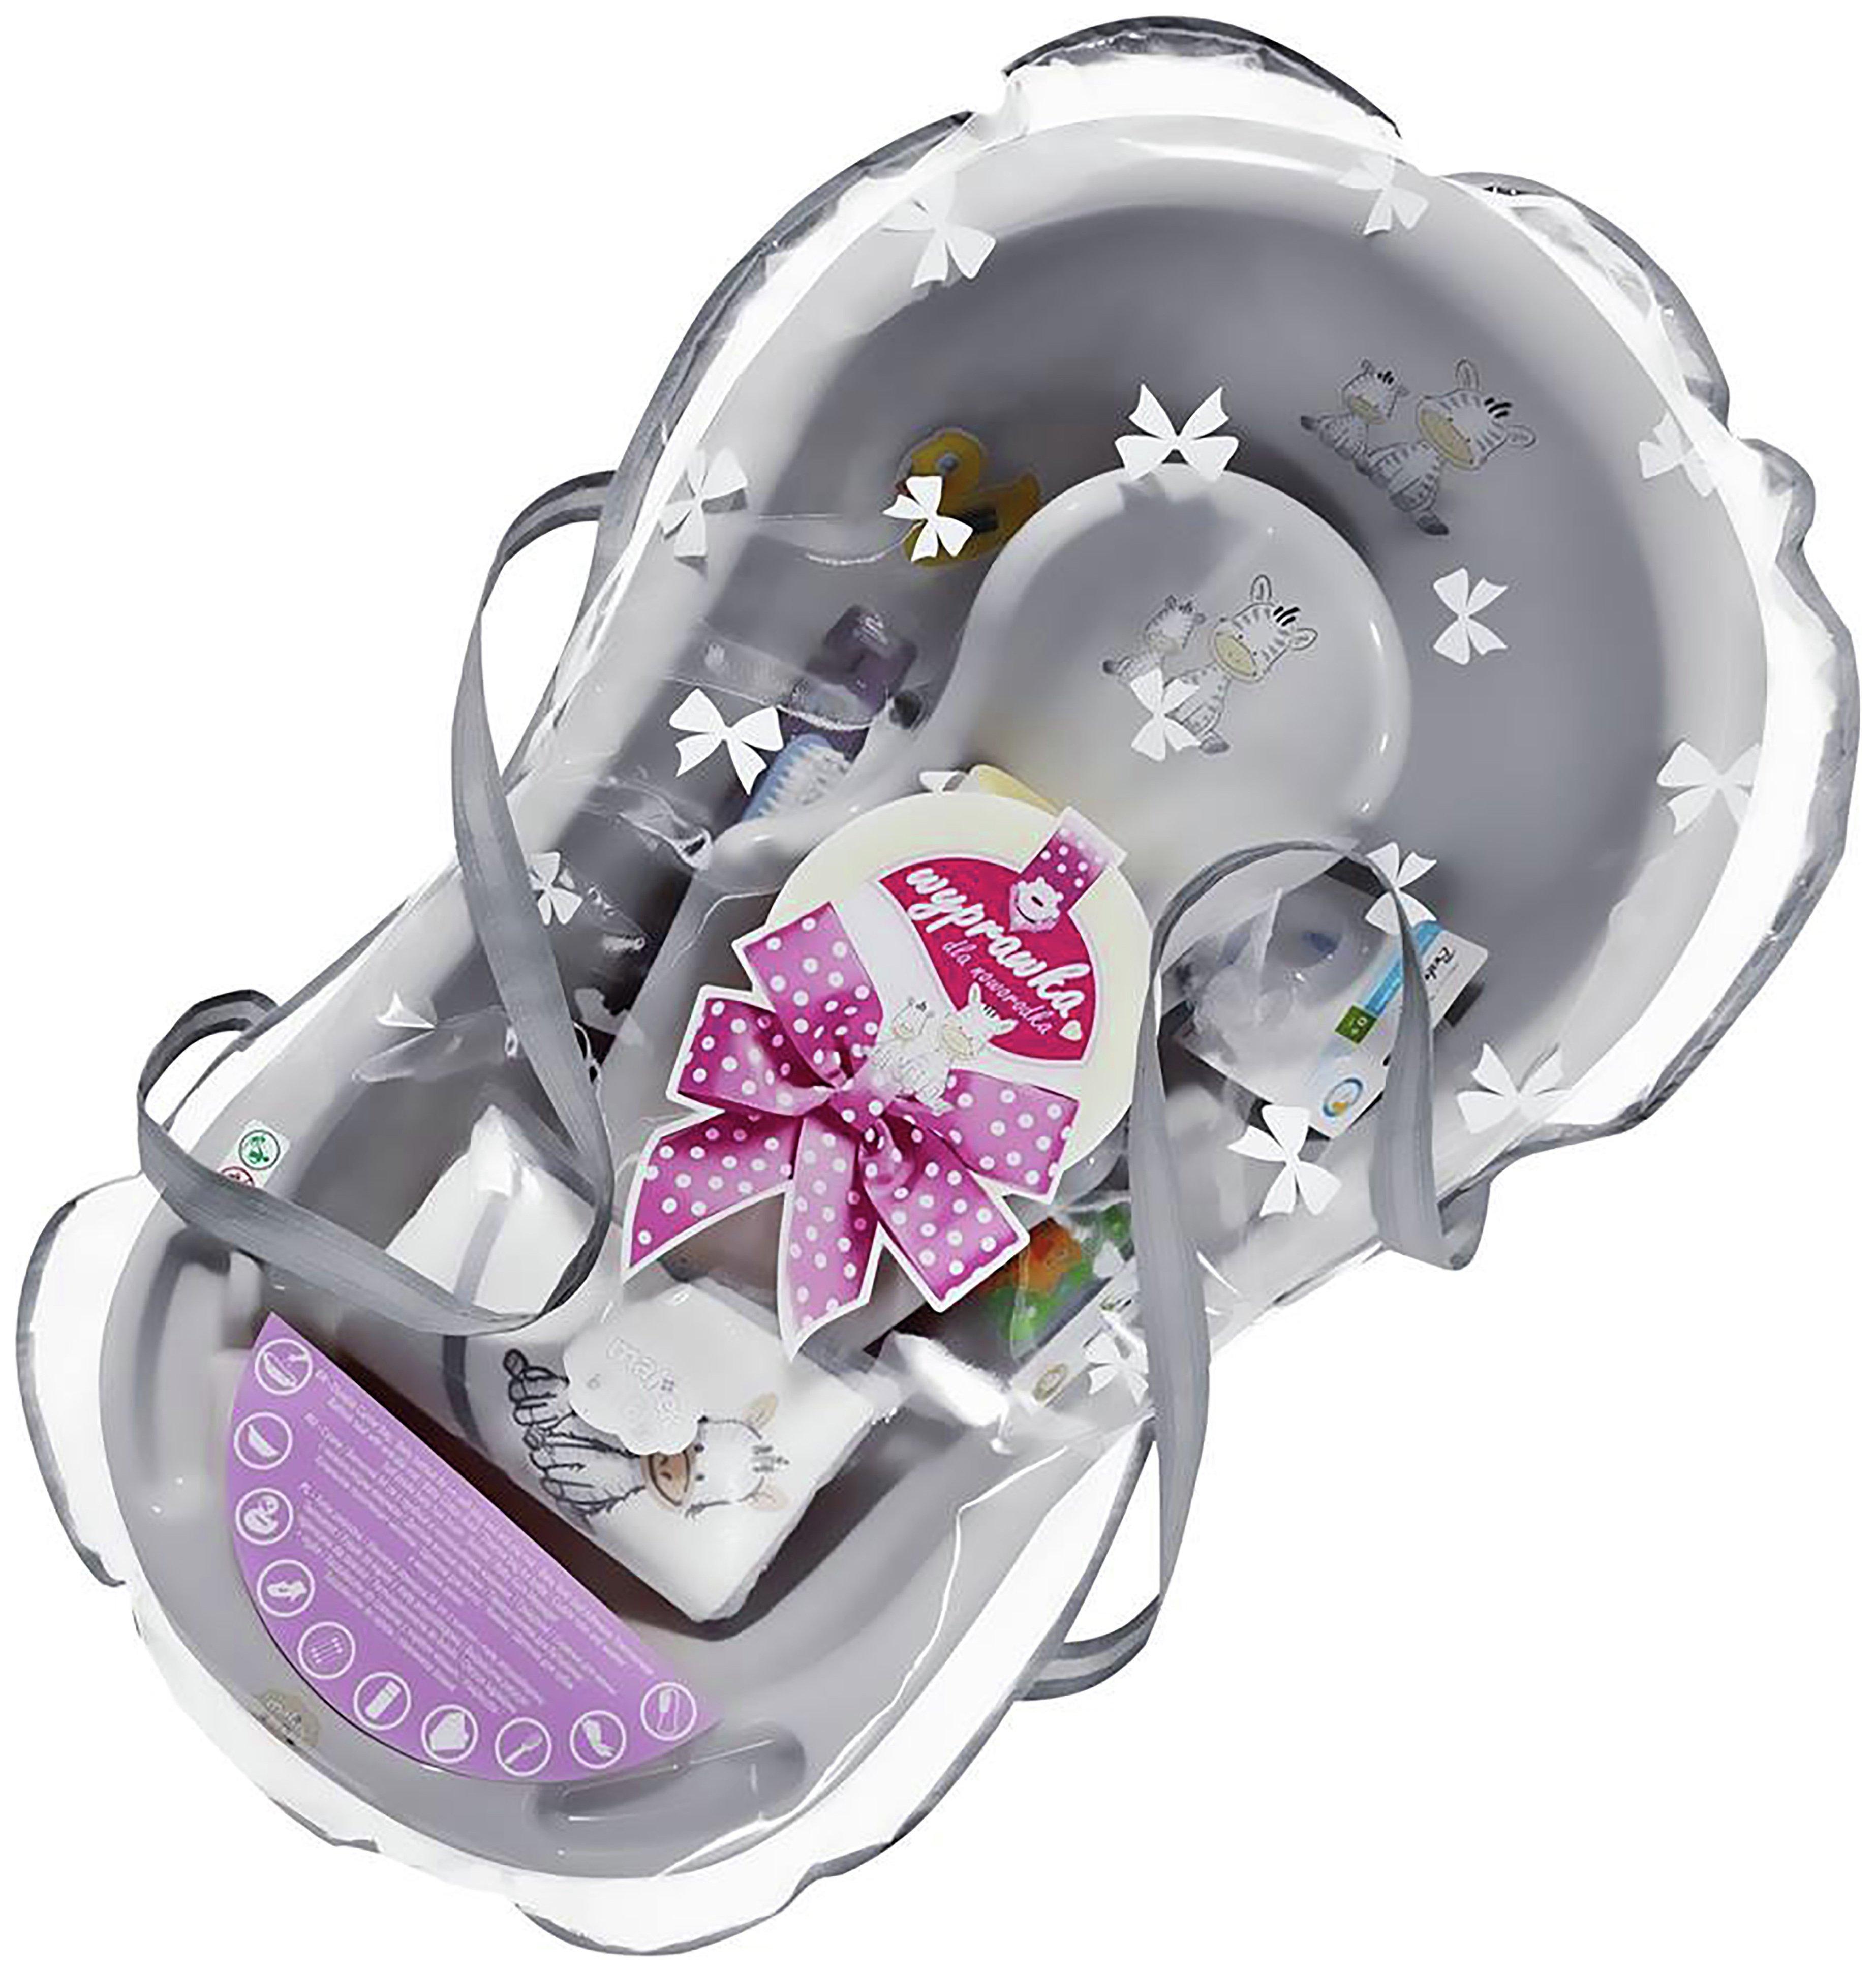 maltex zebra grey baby bath tub gift set 84cm review. Black Bedroom Furniture Sets. Home Design Ideas